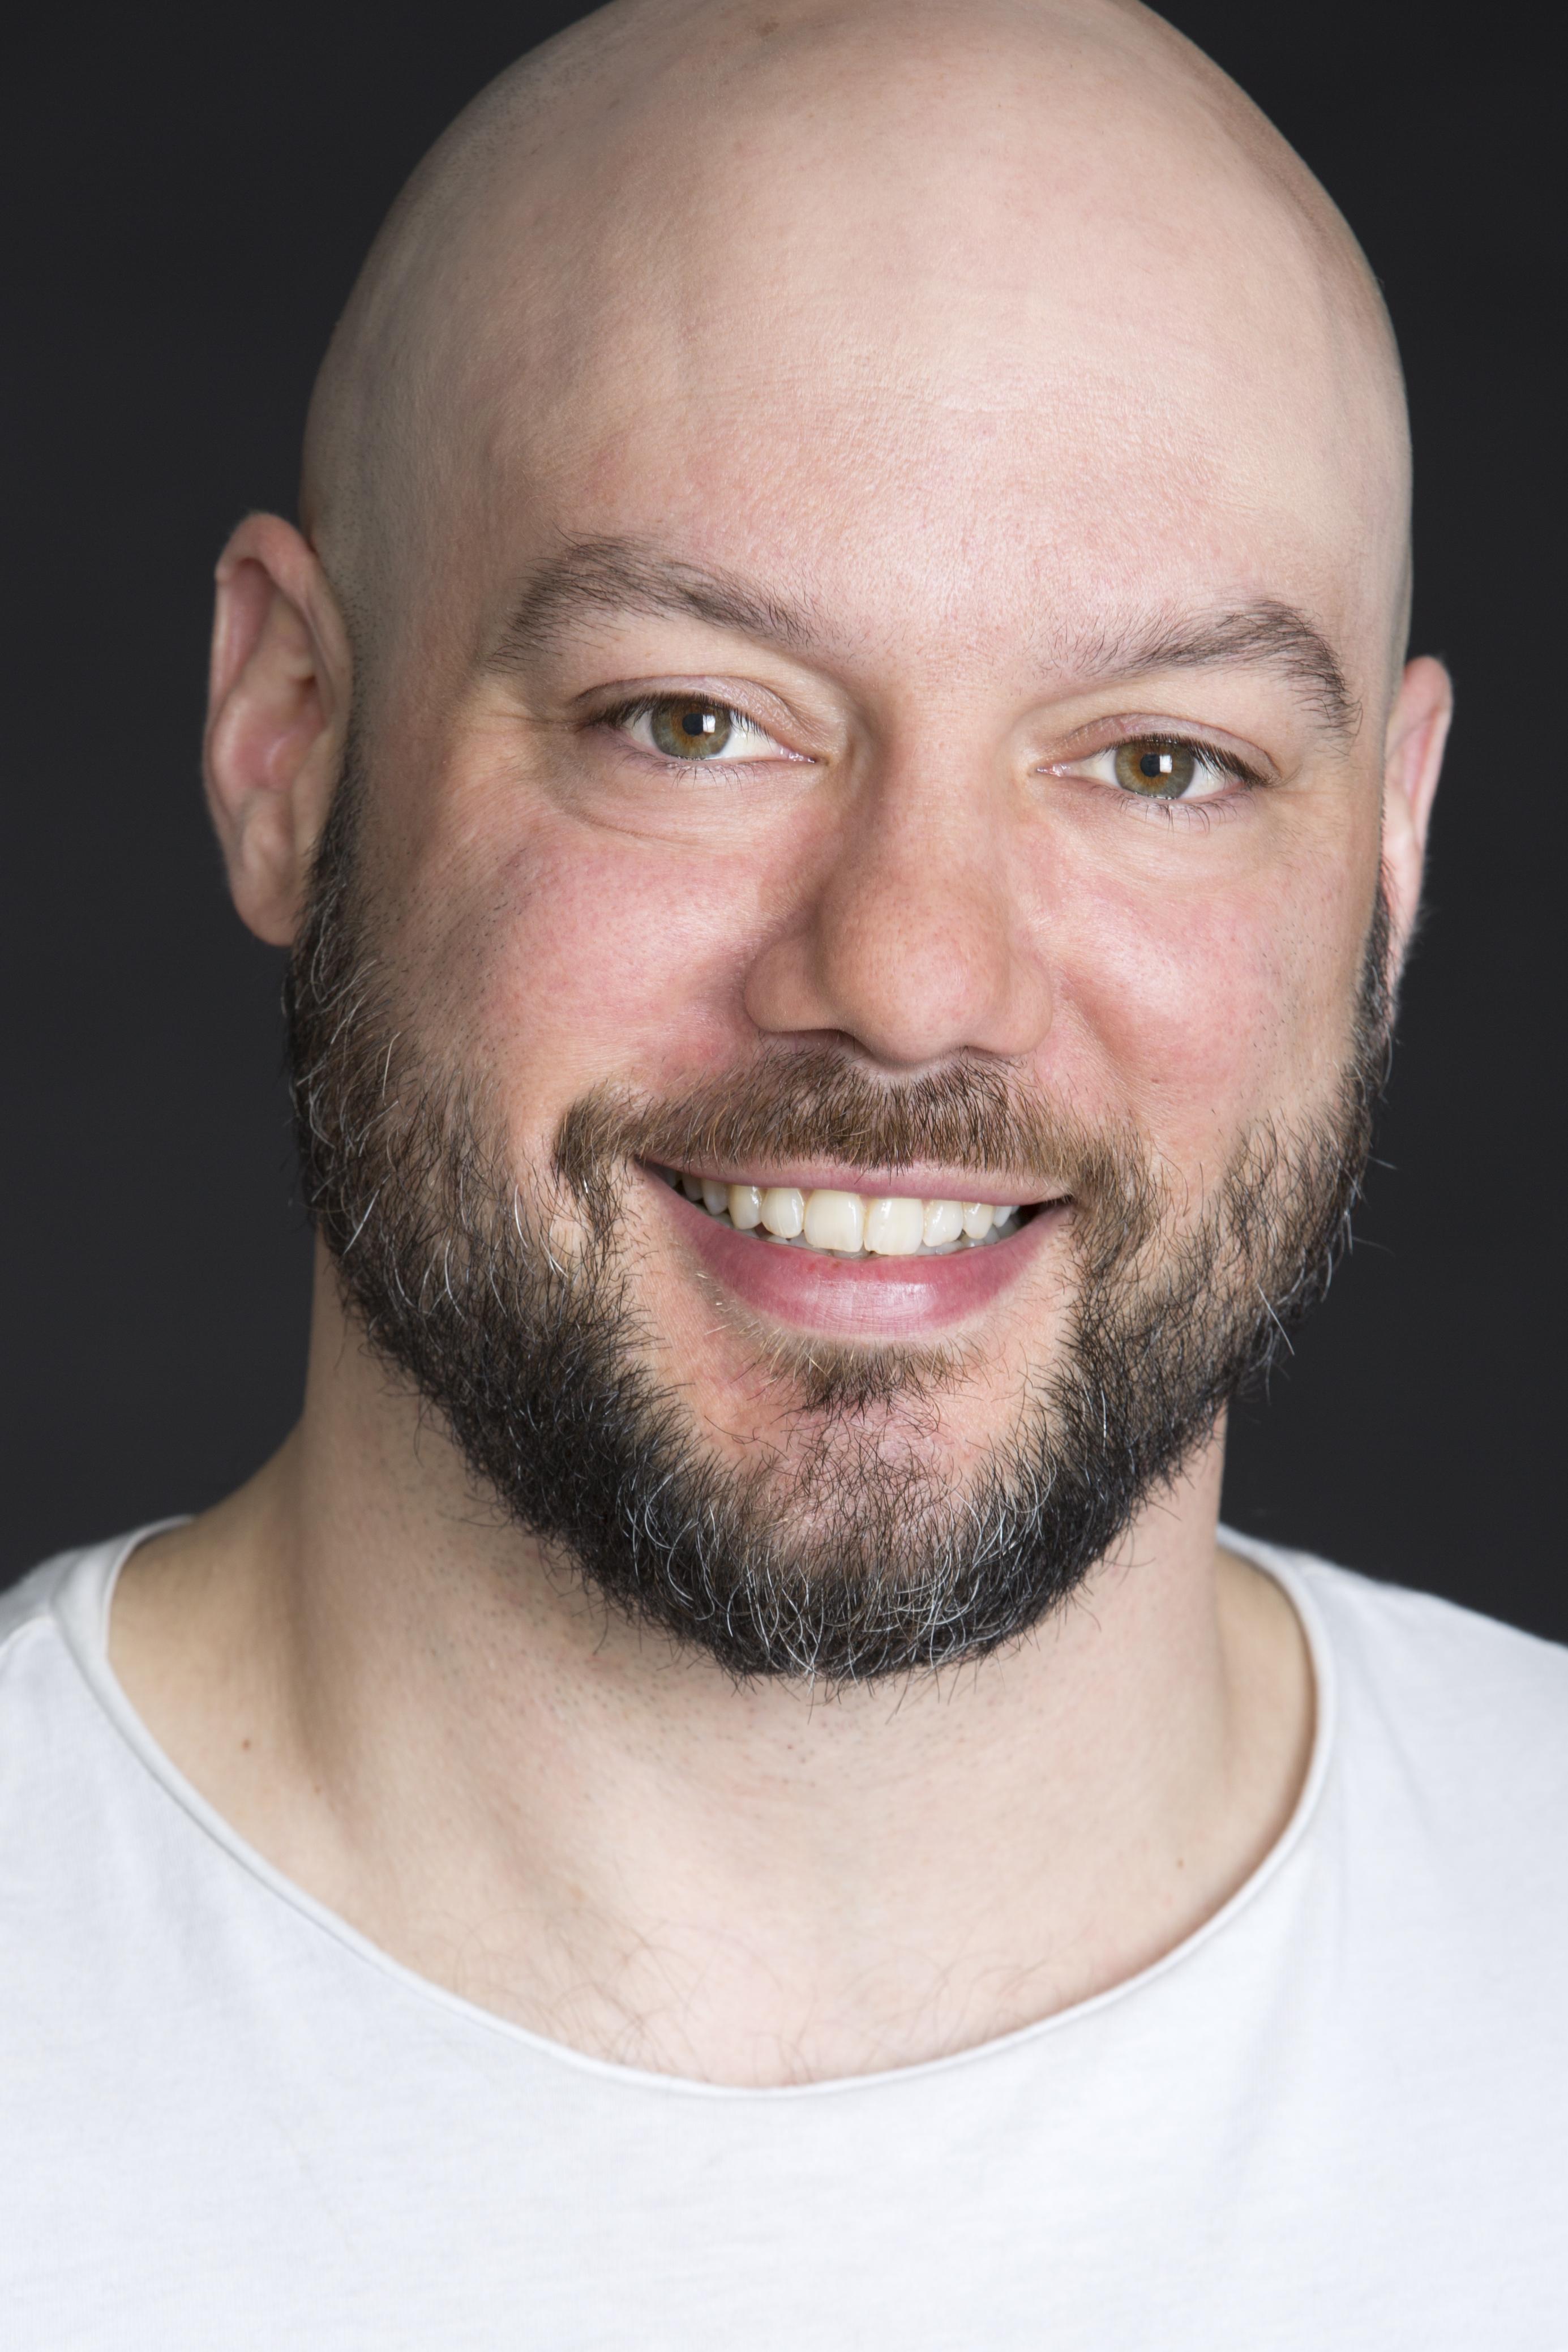 Justin Laramée | Union Des Artistes concernant Justin Laramée